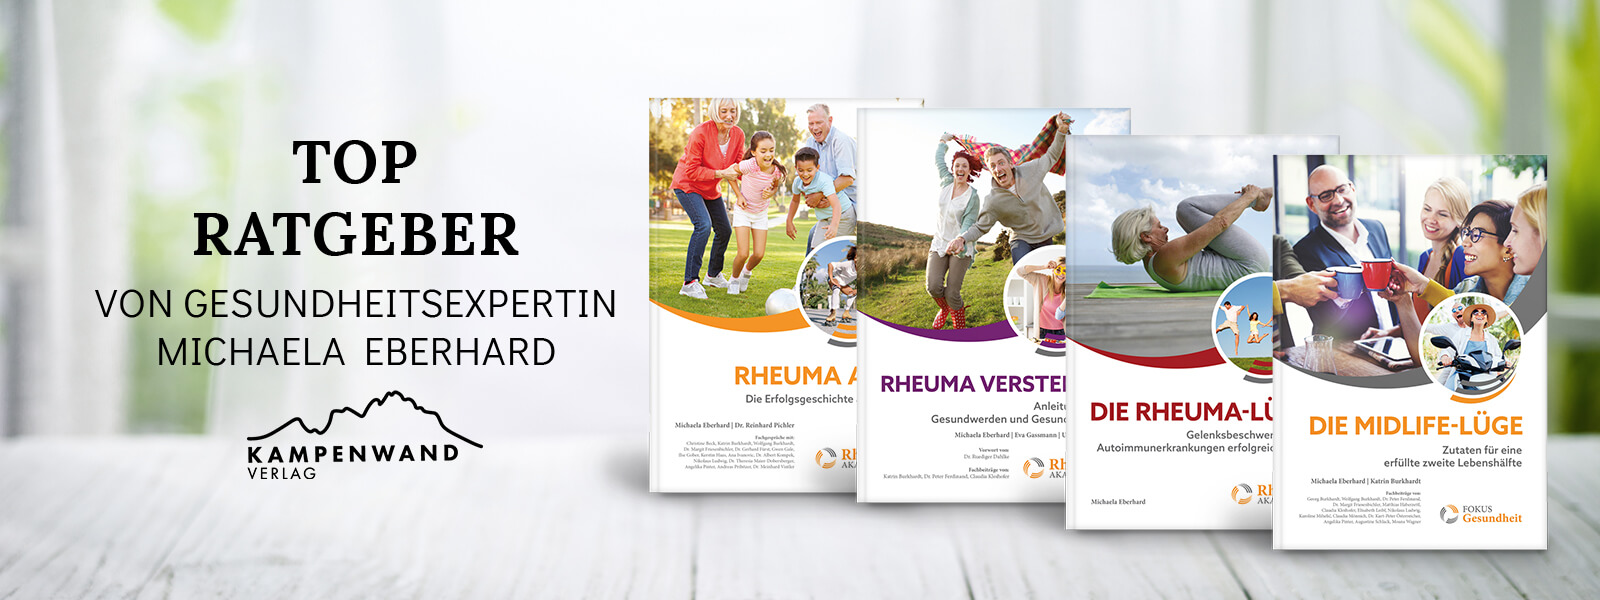 Rheuma-Bücher der Rheuma-Akademie von Michaela Eberhard